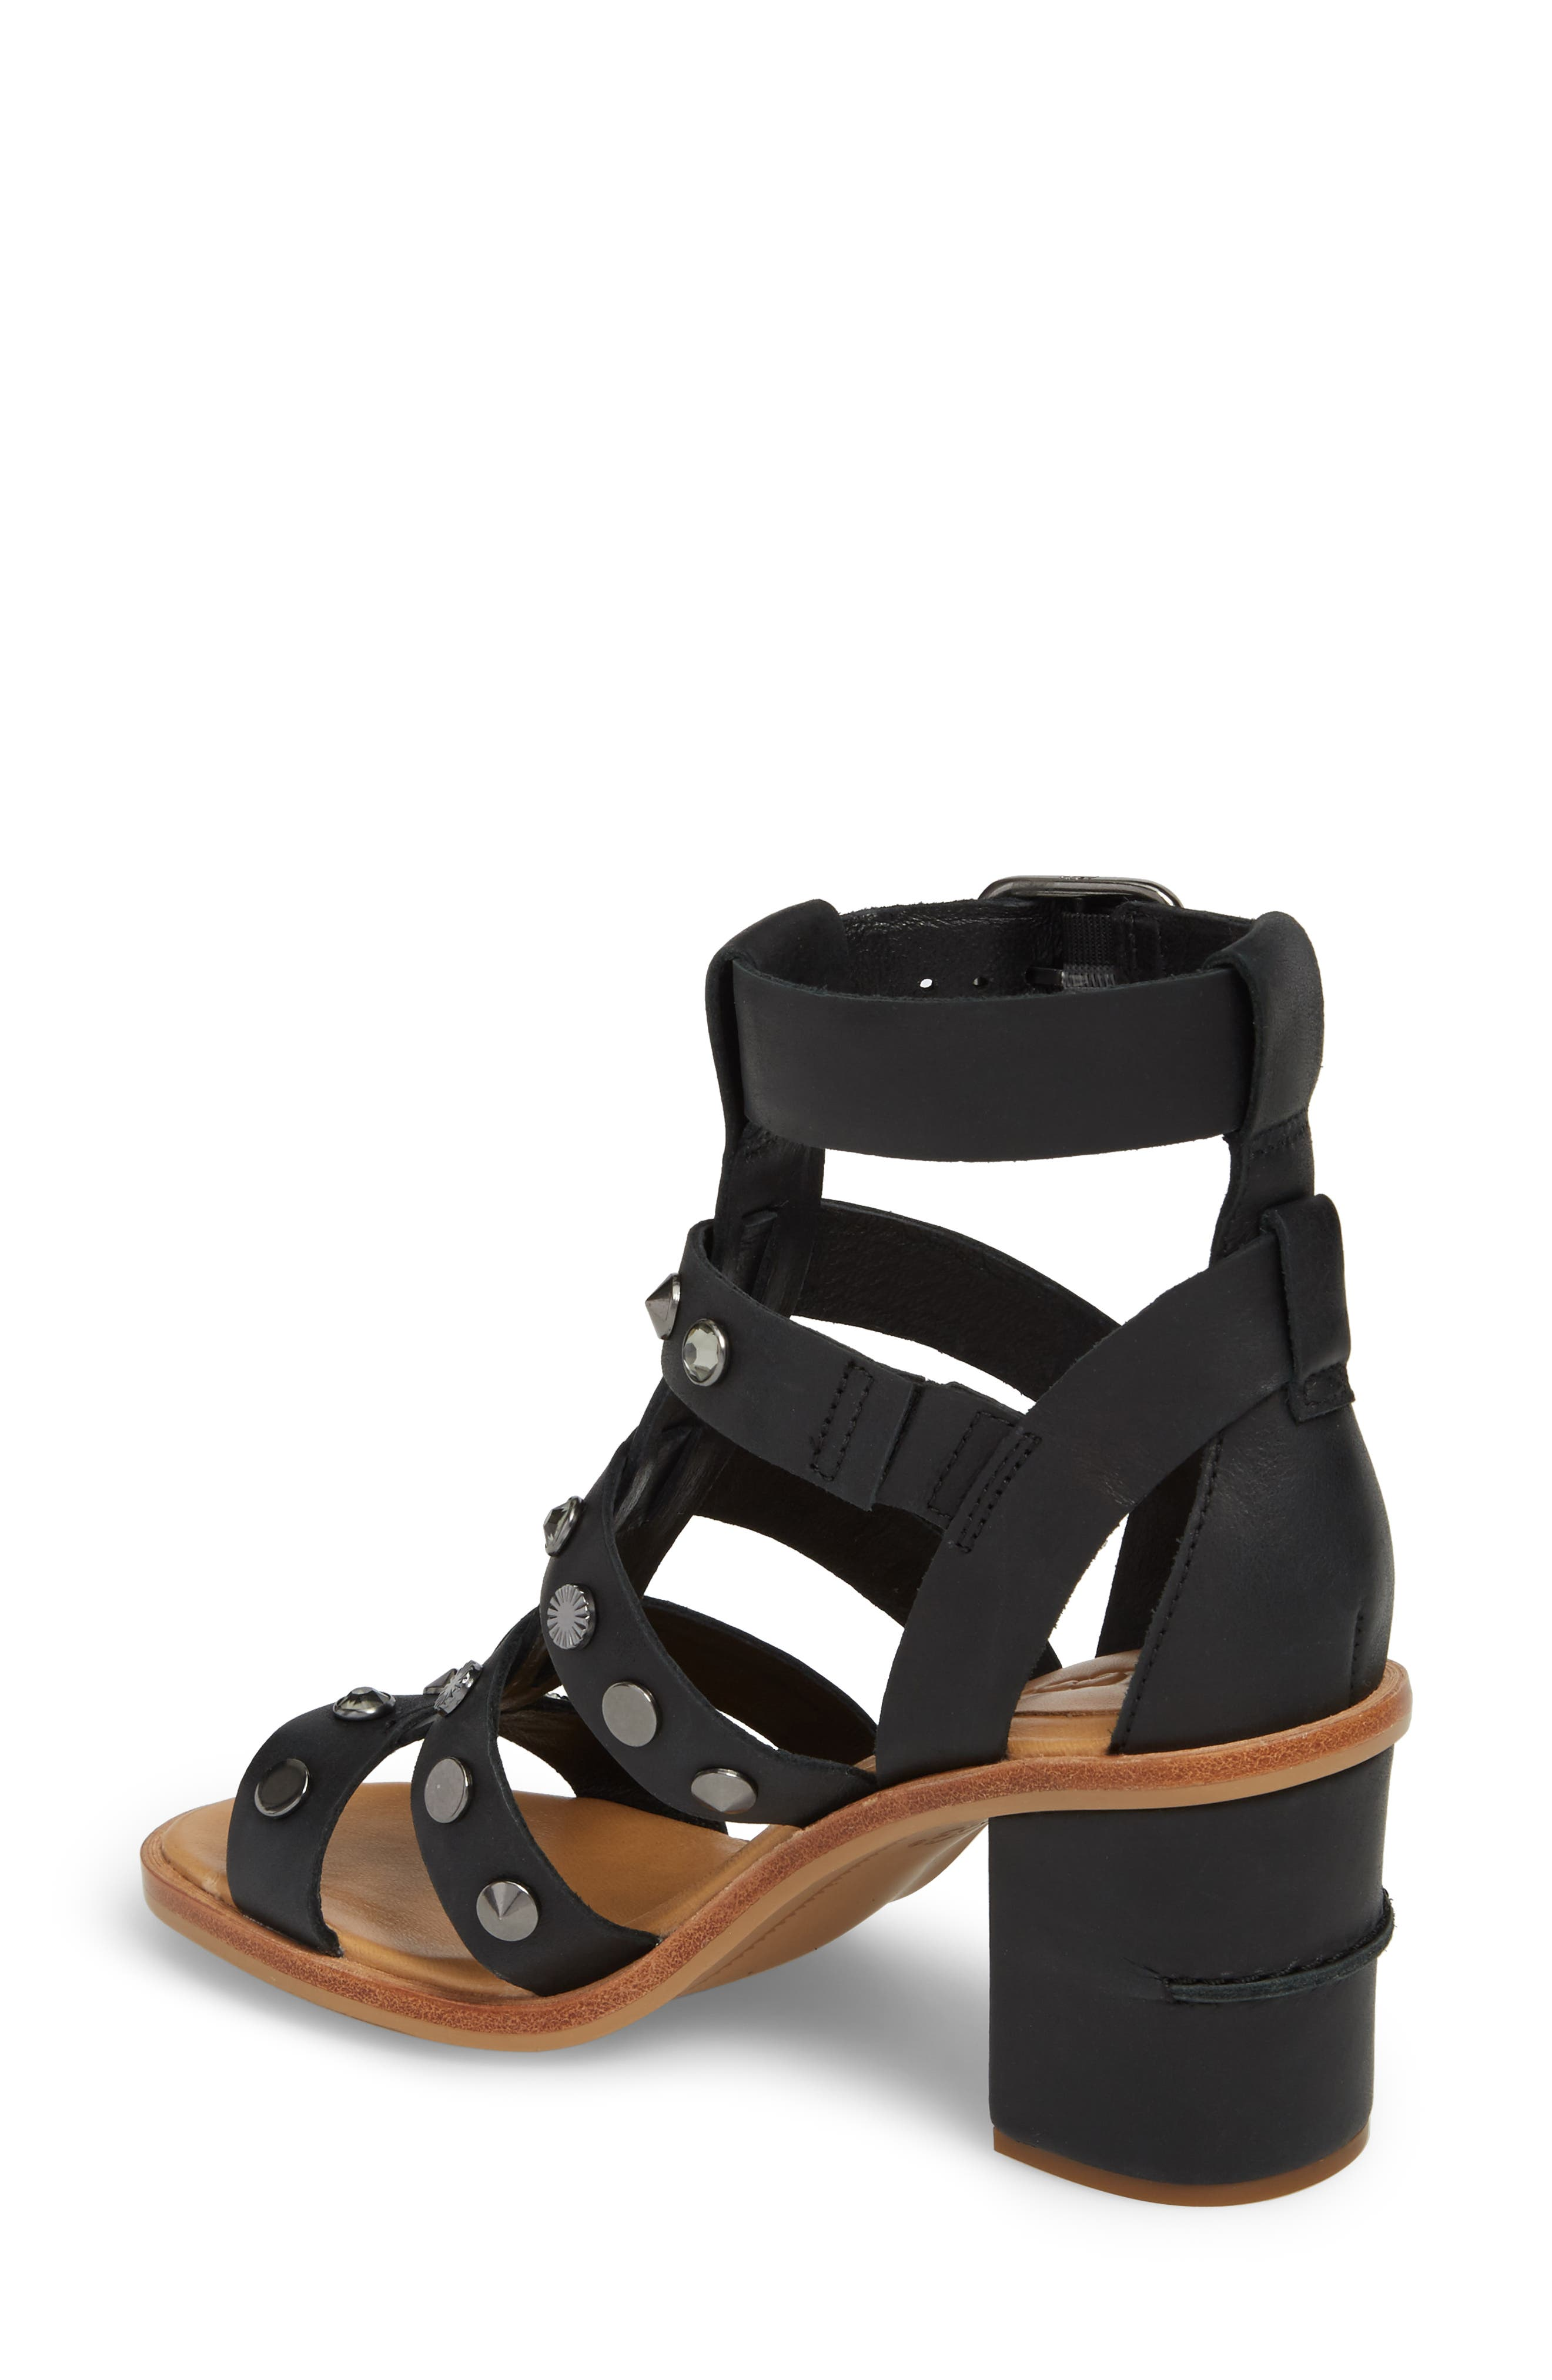 Macayla Studded Sandal,                             Alternate thumbnail 2, color,                             BLACK LEATHER